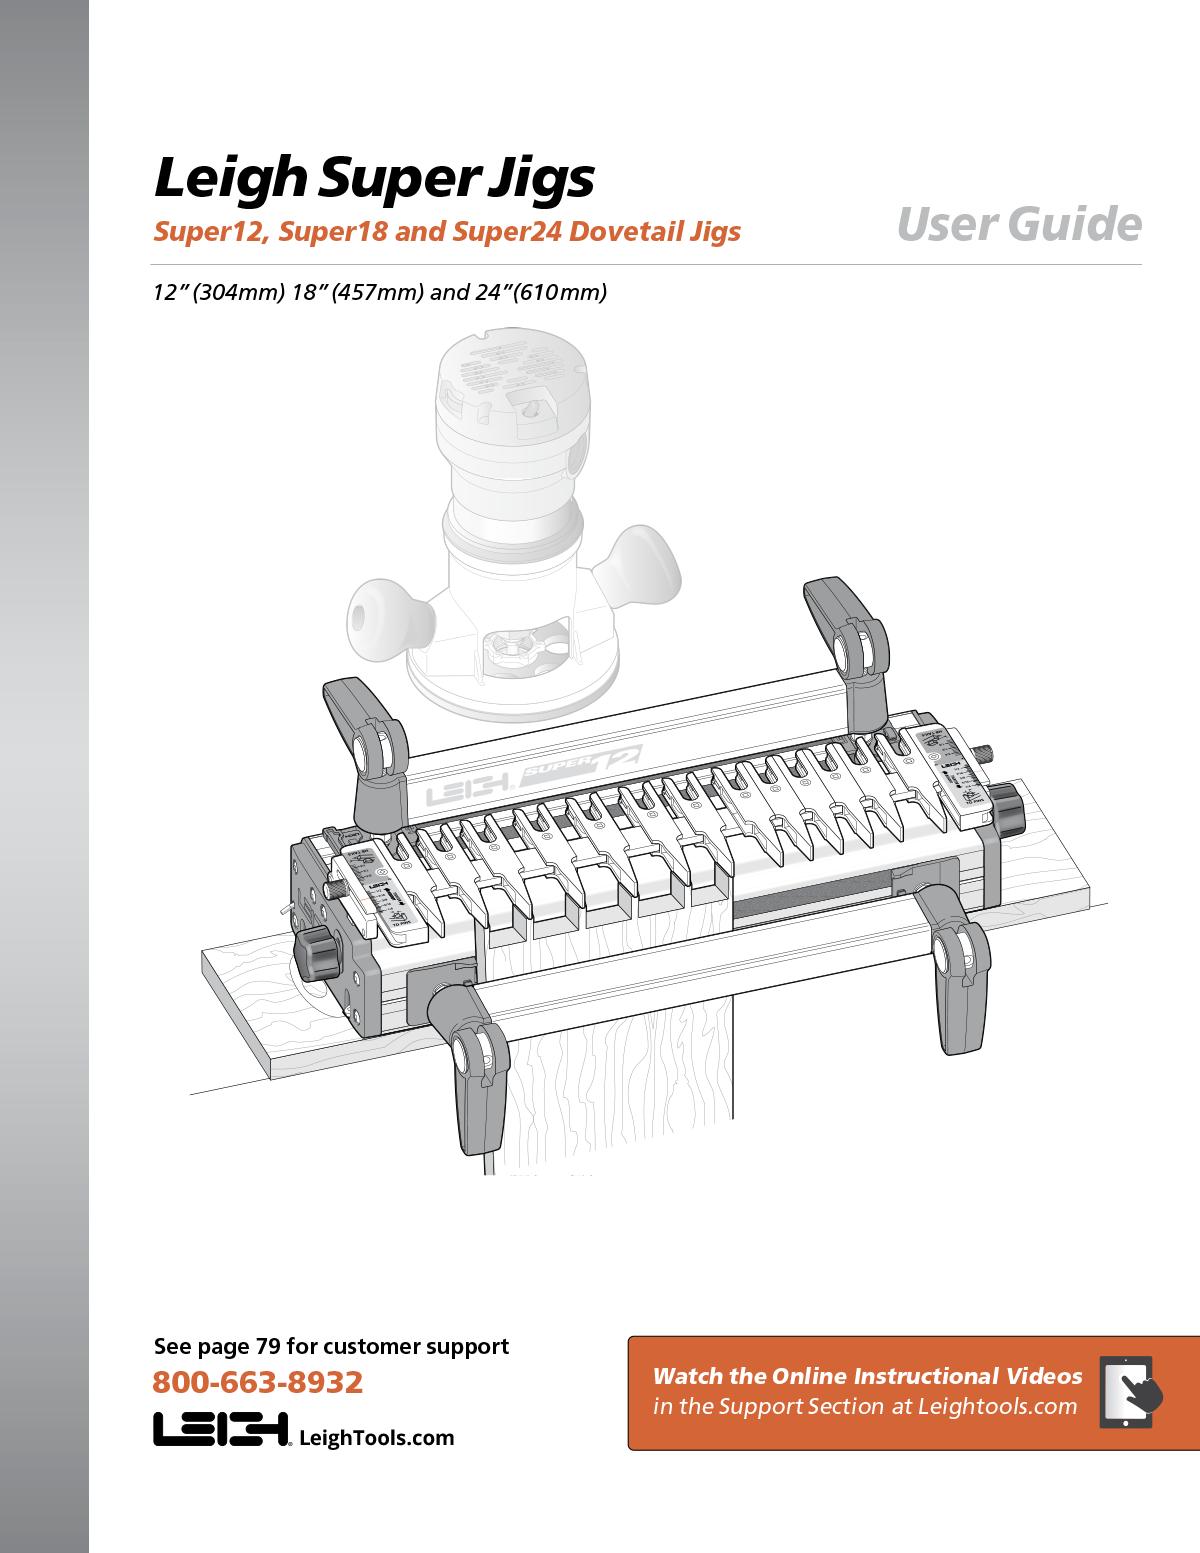 Super Jigs User Guide - Complete